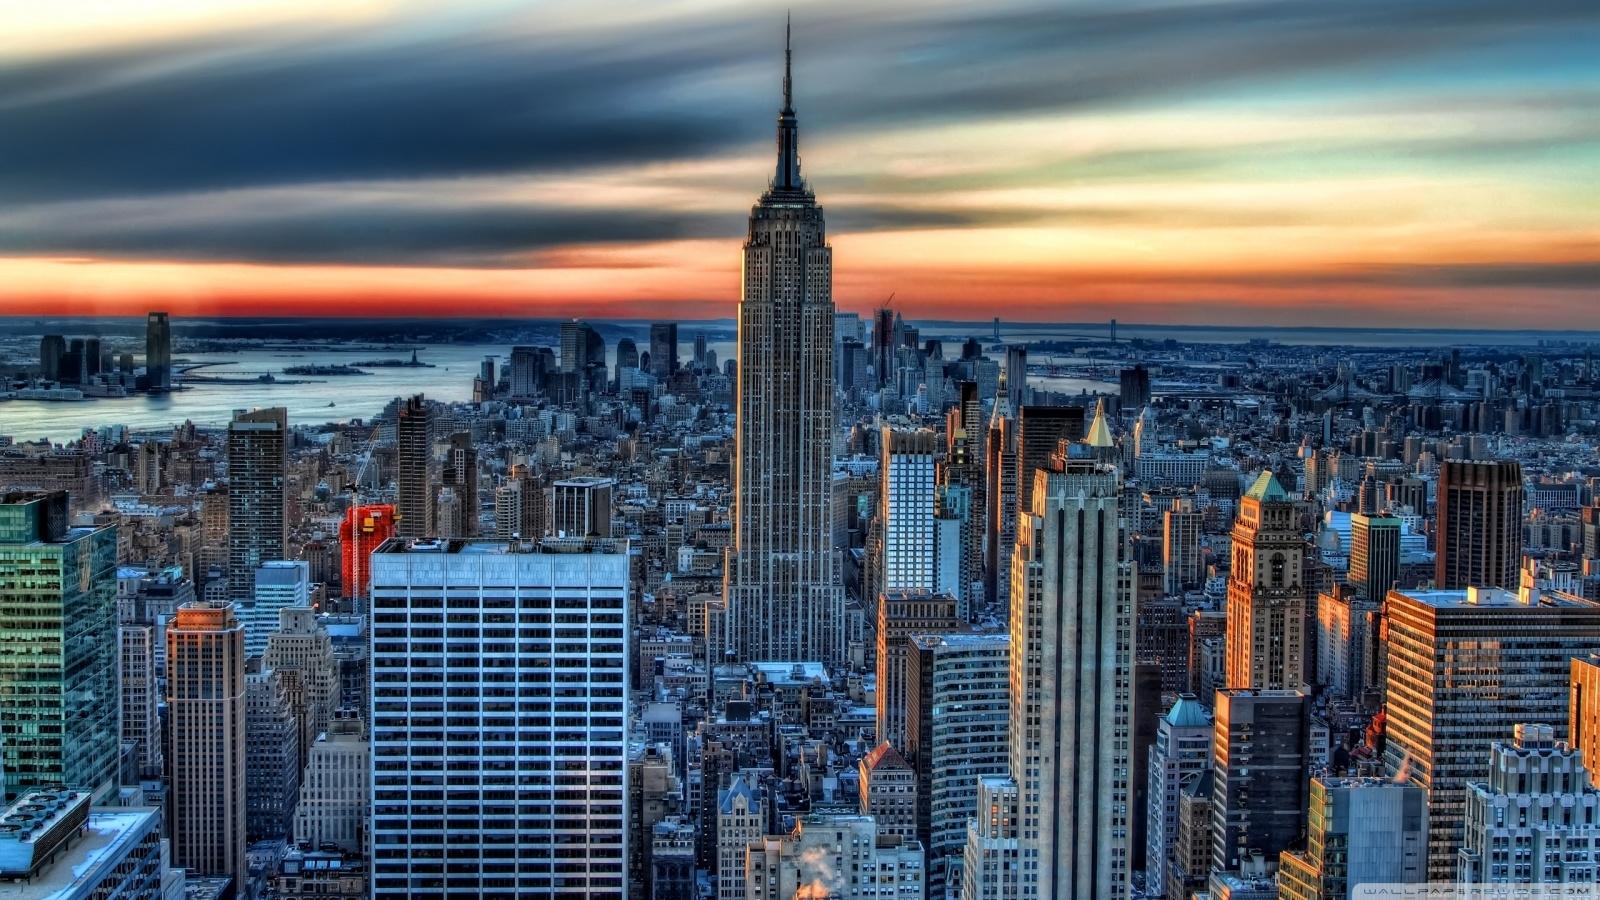 new york city hdr ❤ 4k hd desktop wallpaper for 4k ultra hd tv